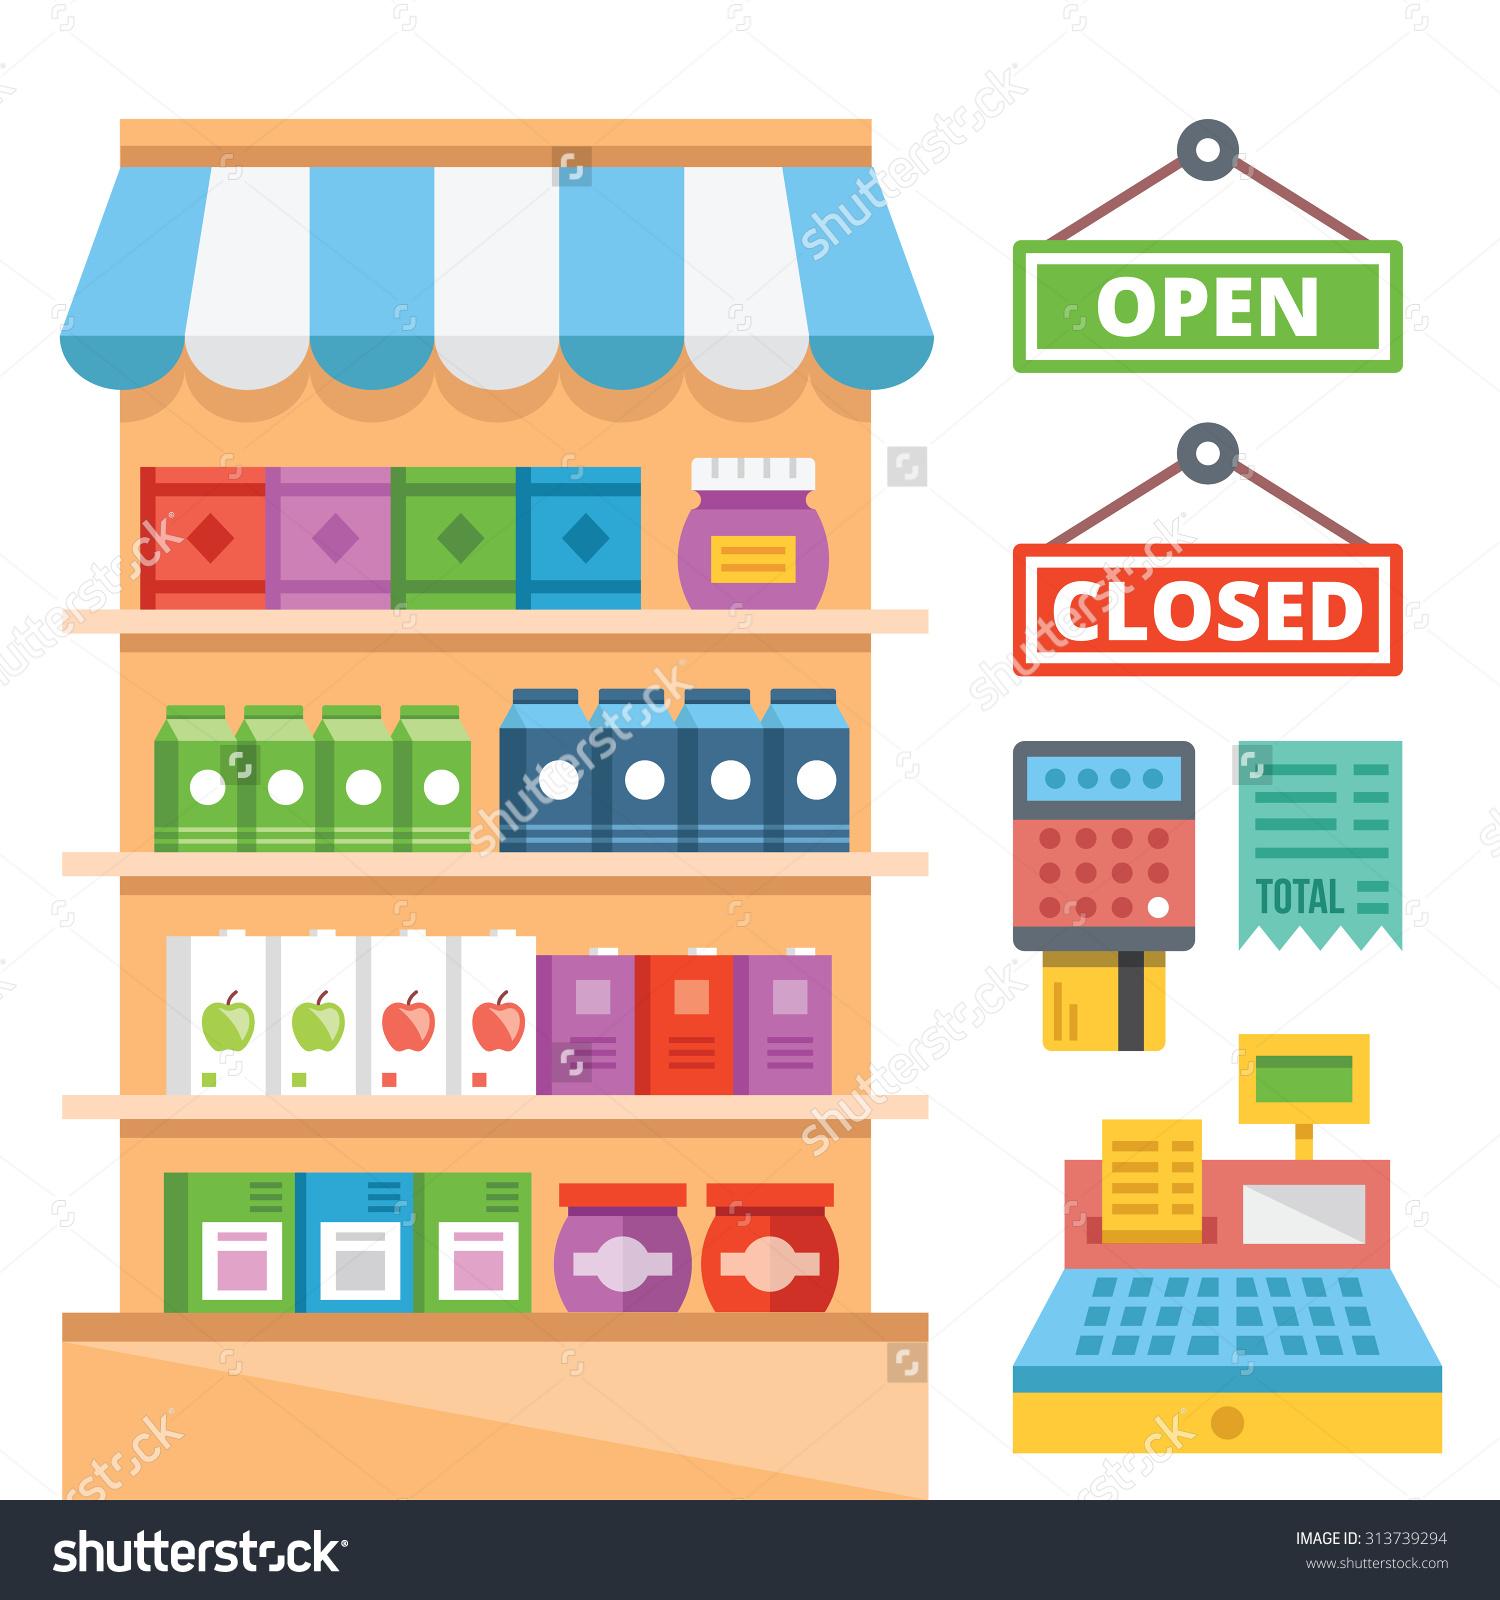 Supermarket Shelves General Store Equipment Flat Stock Vector.